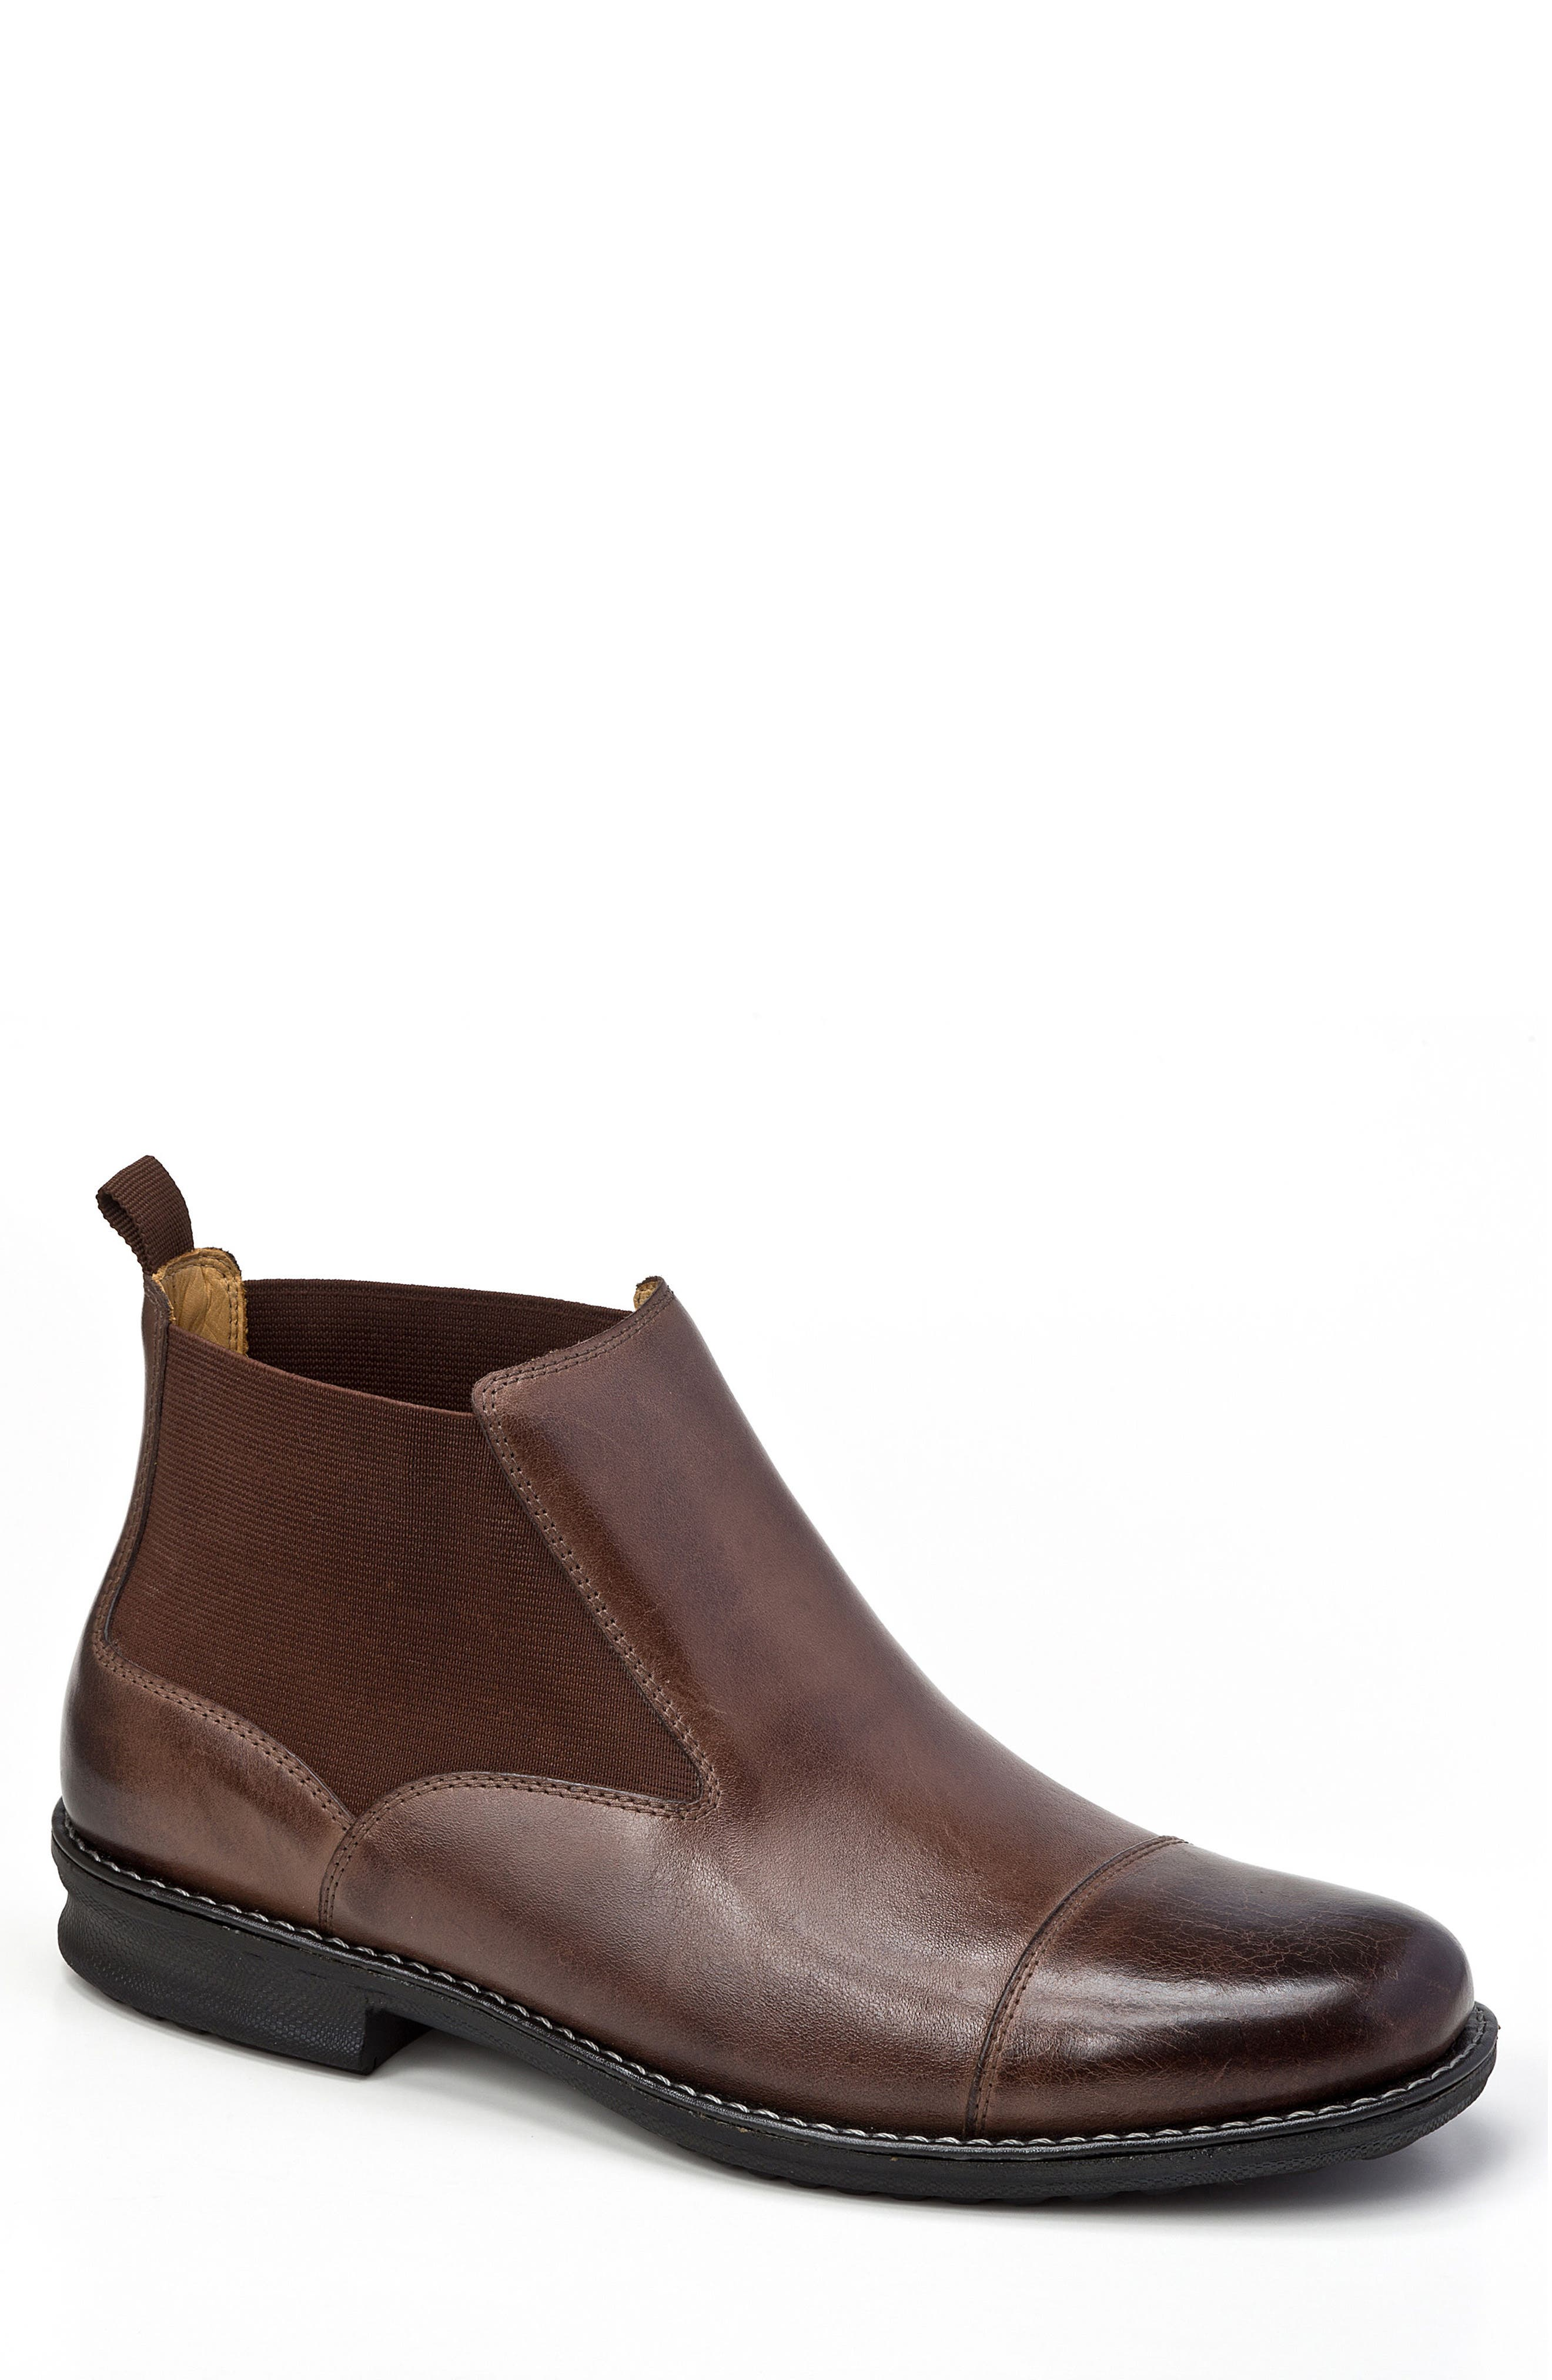 Norbert Chelsea Boot,                         Main,                         color, 200